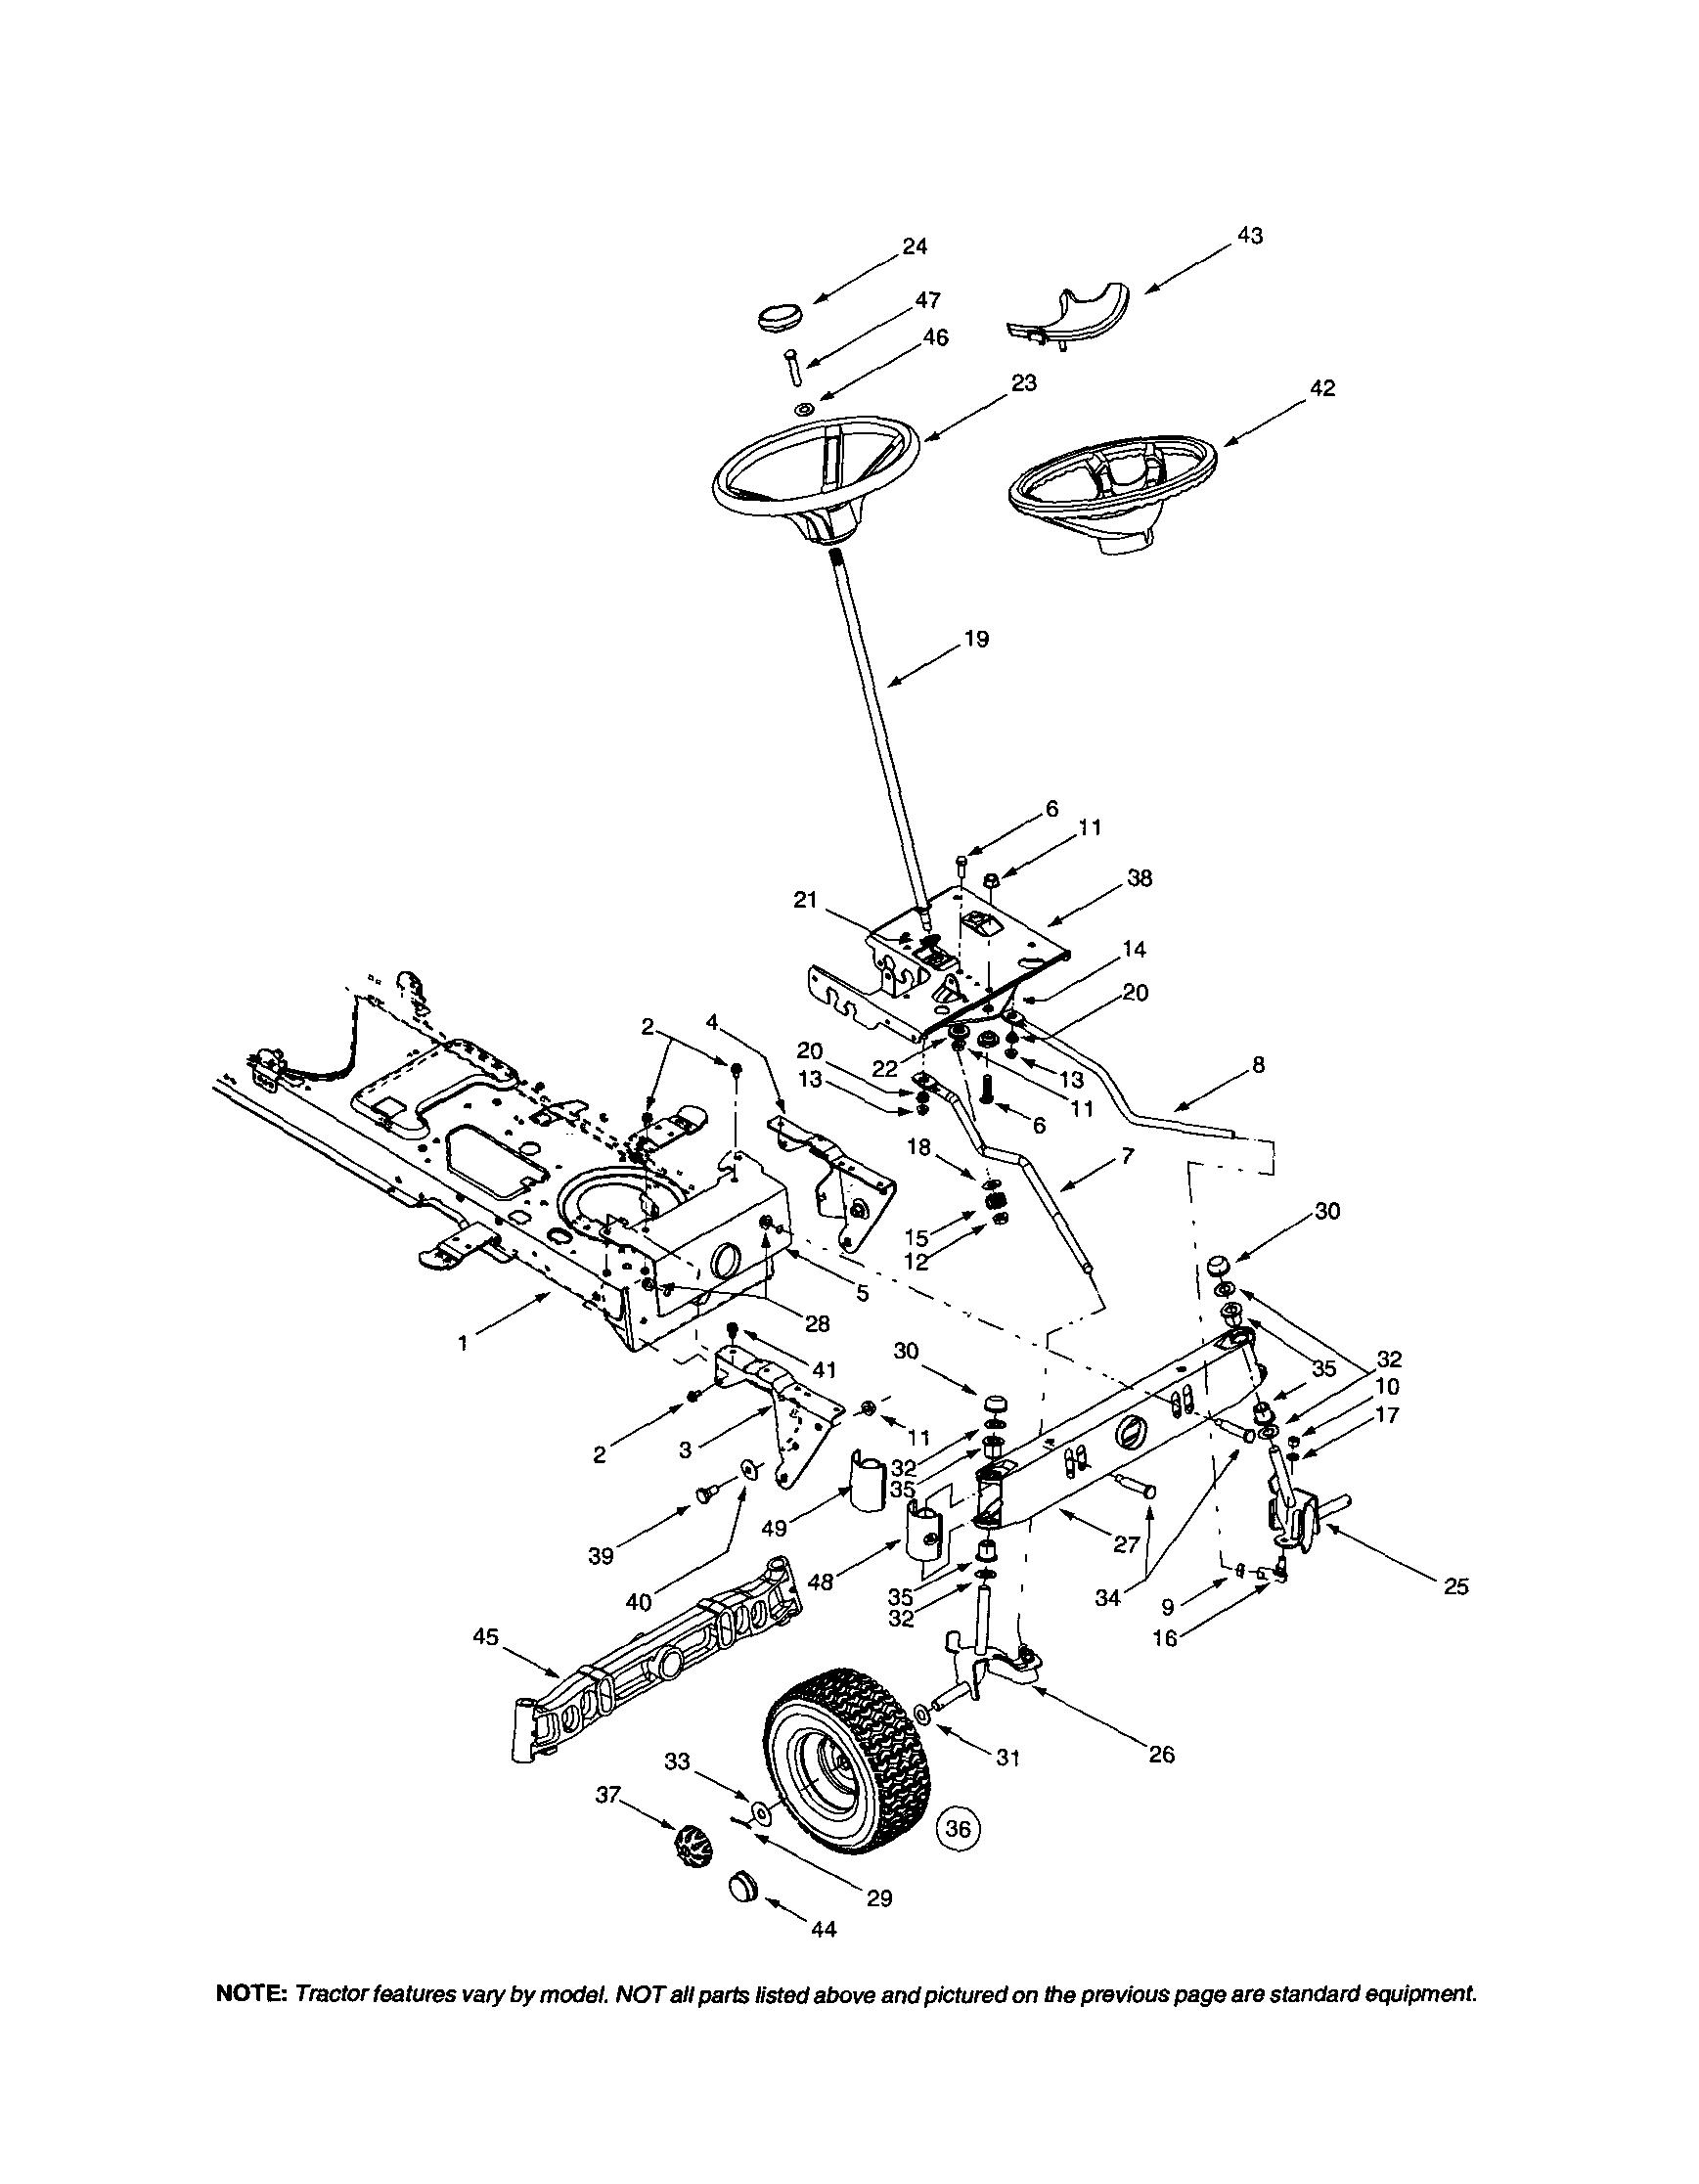 husqvarna lawn mower steering diagram [ 1737 x 2233 Pixel ]